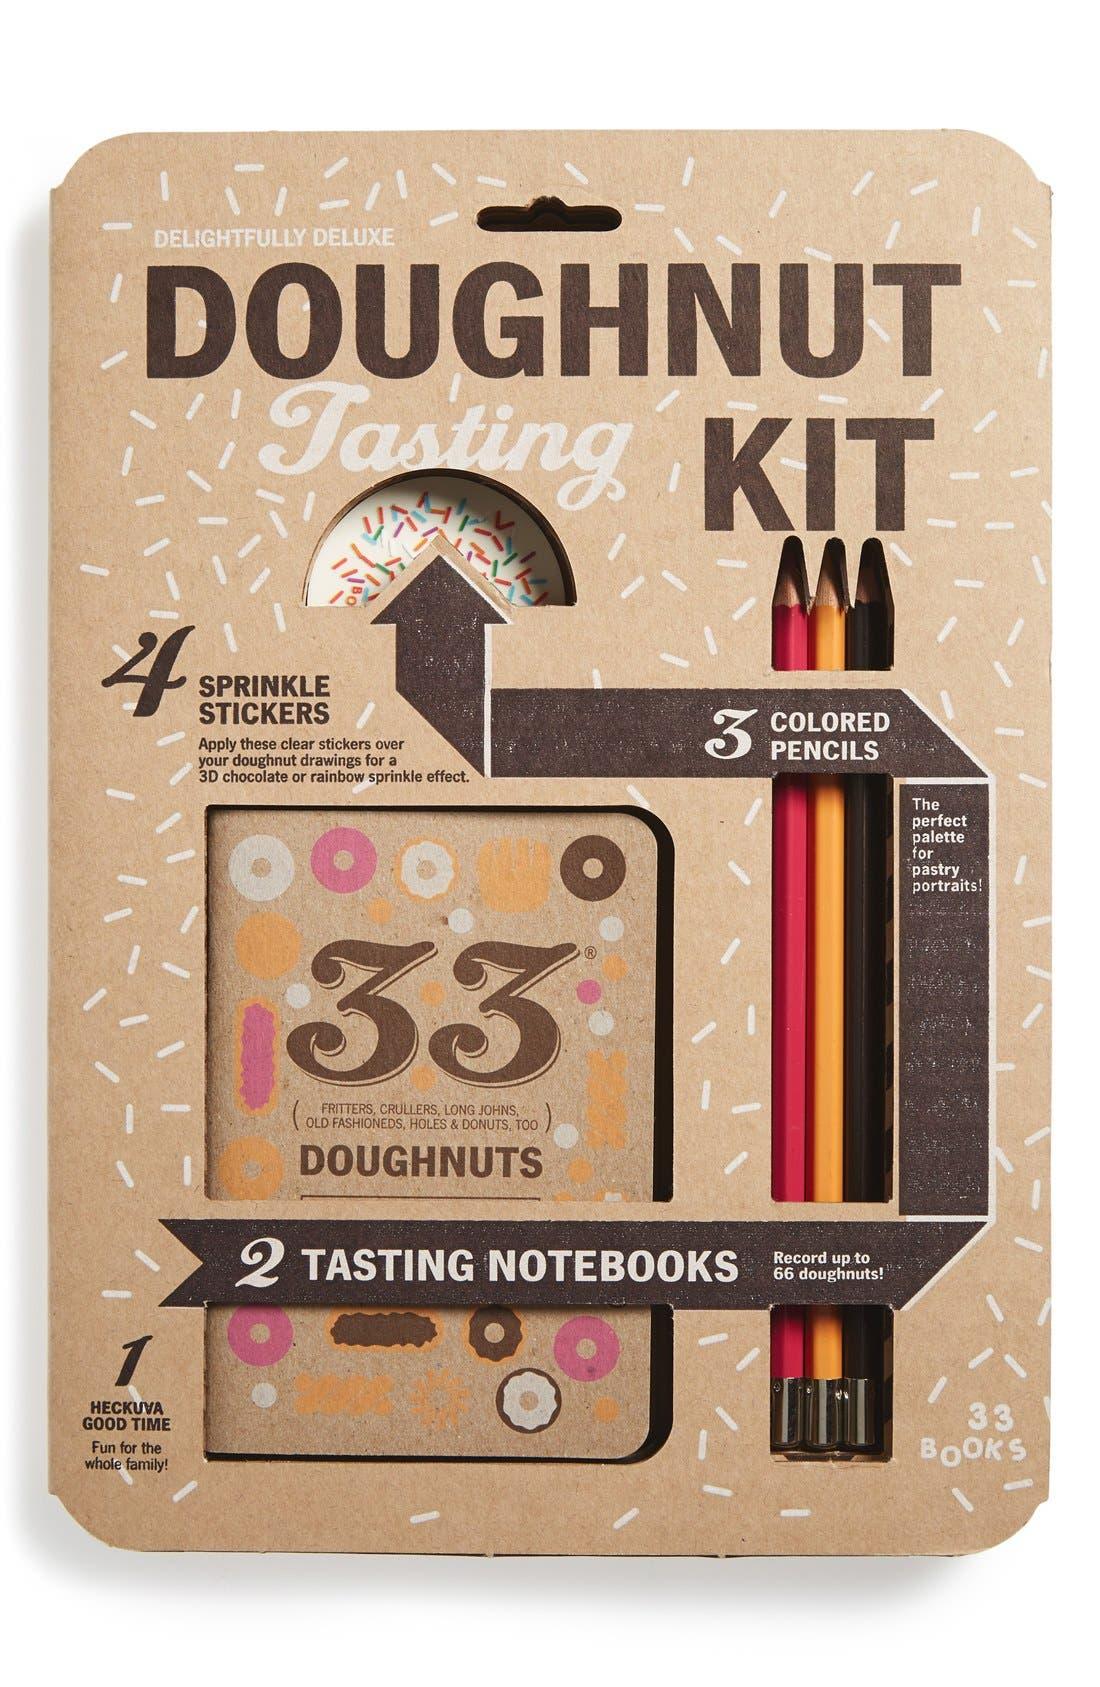 Main Image - 33 Books Co. Doughnut Tasting Set